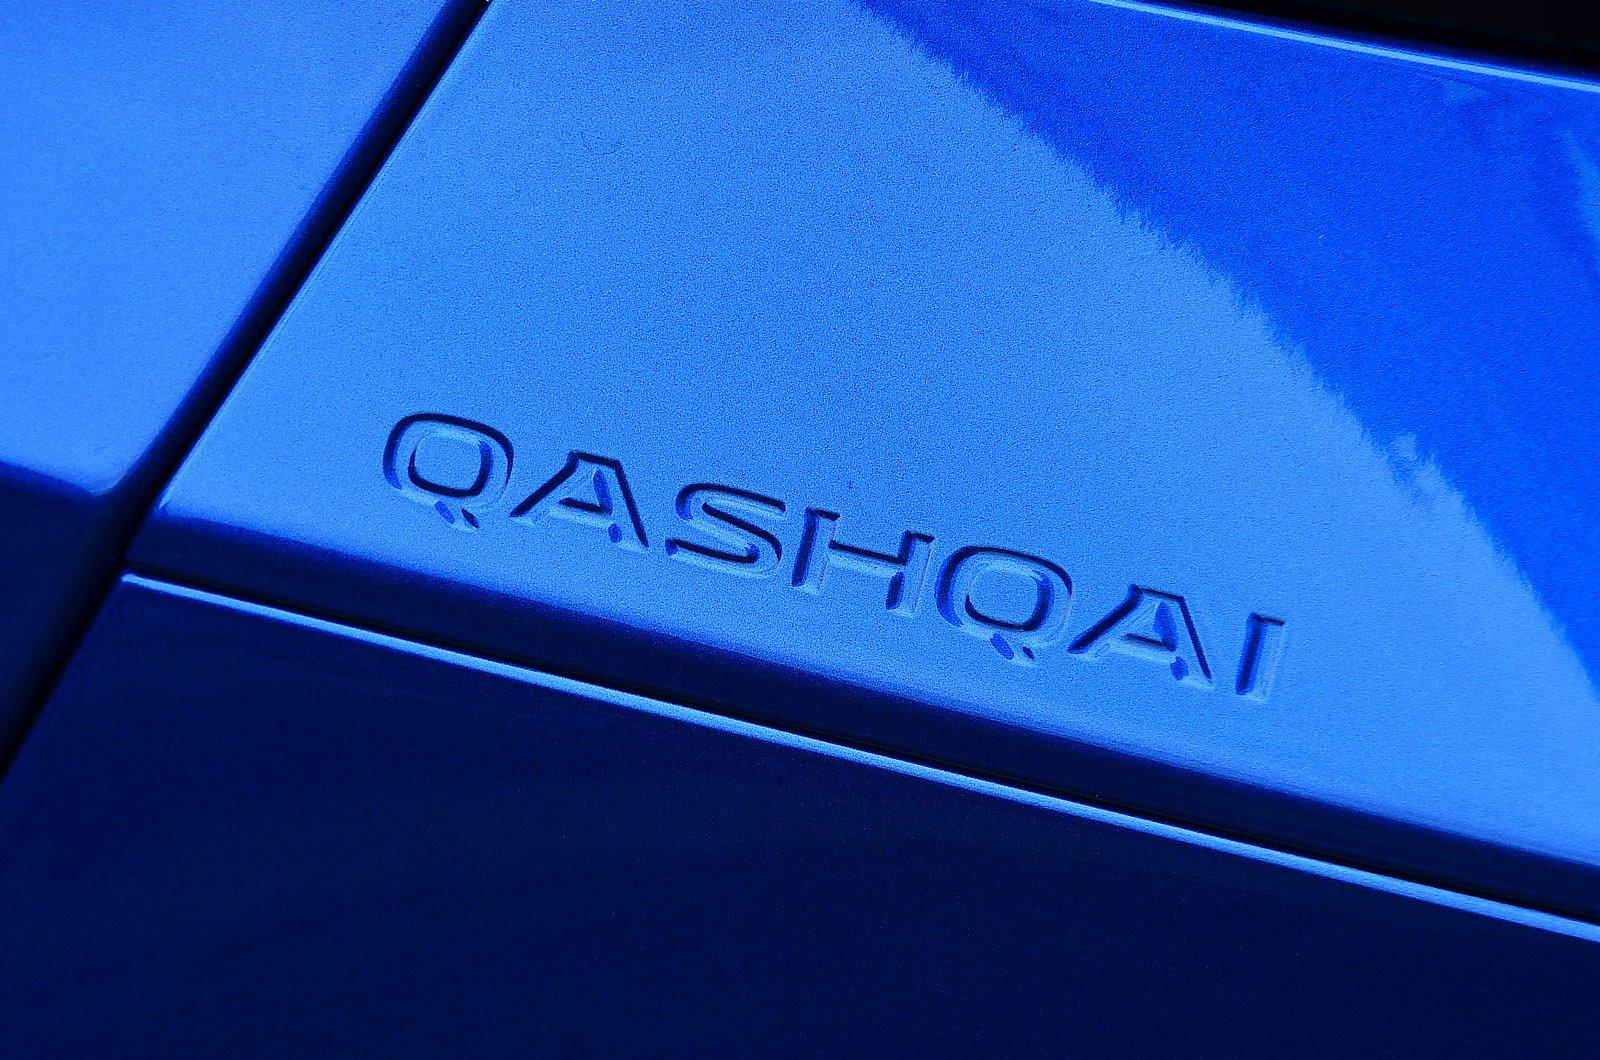 Nissan Qashqai 2021 boot badge